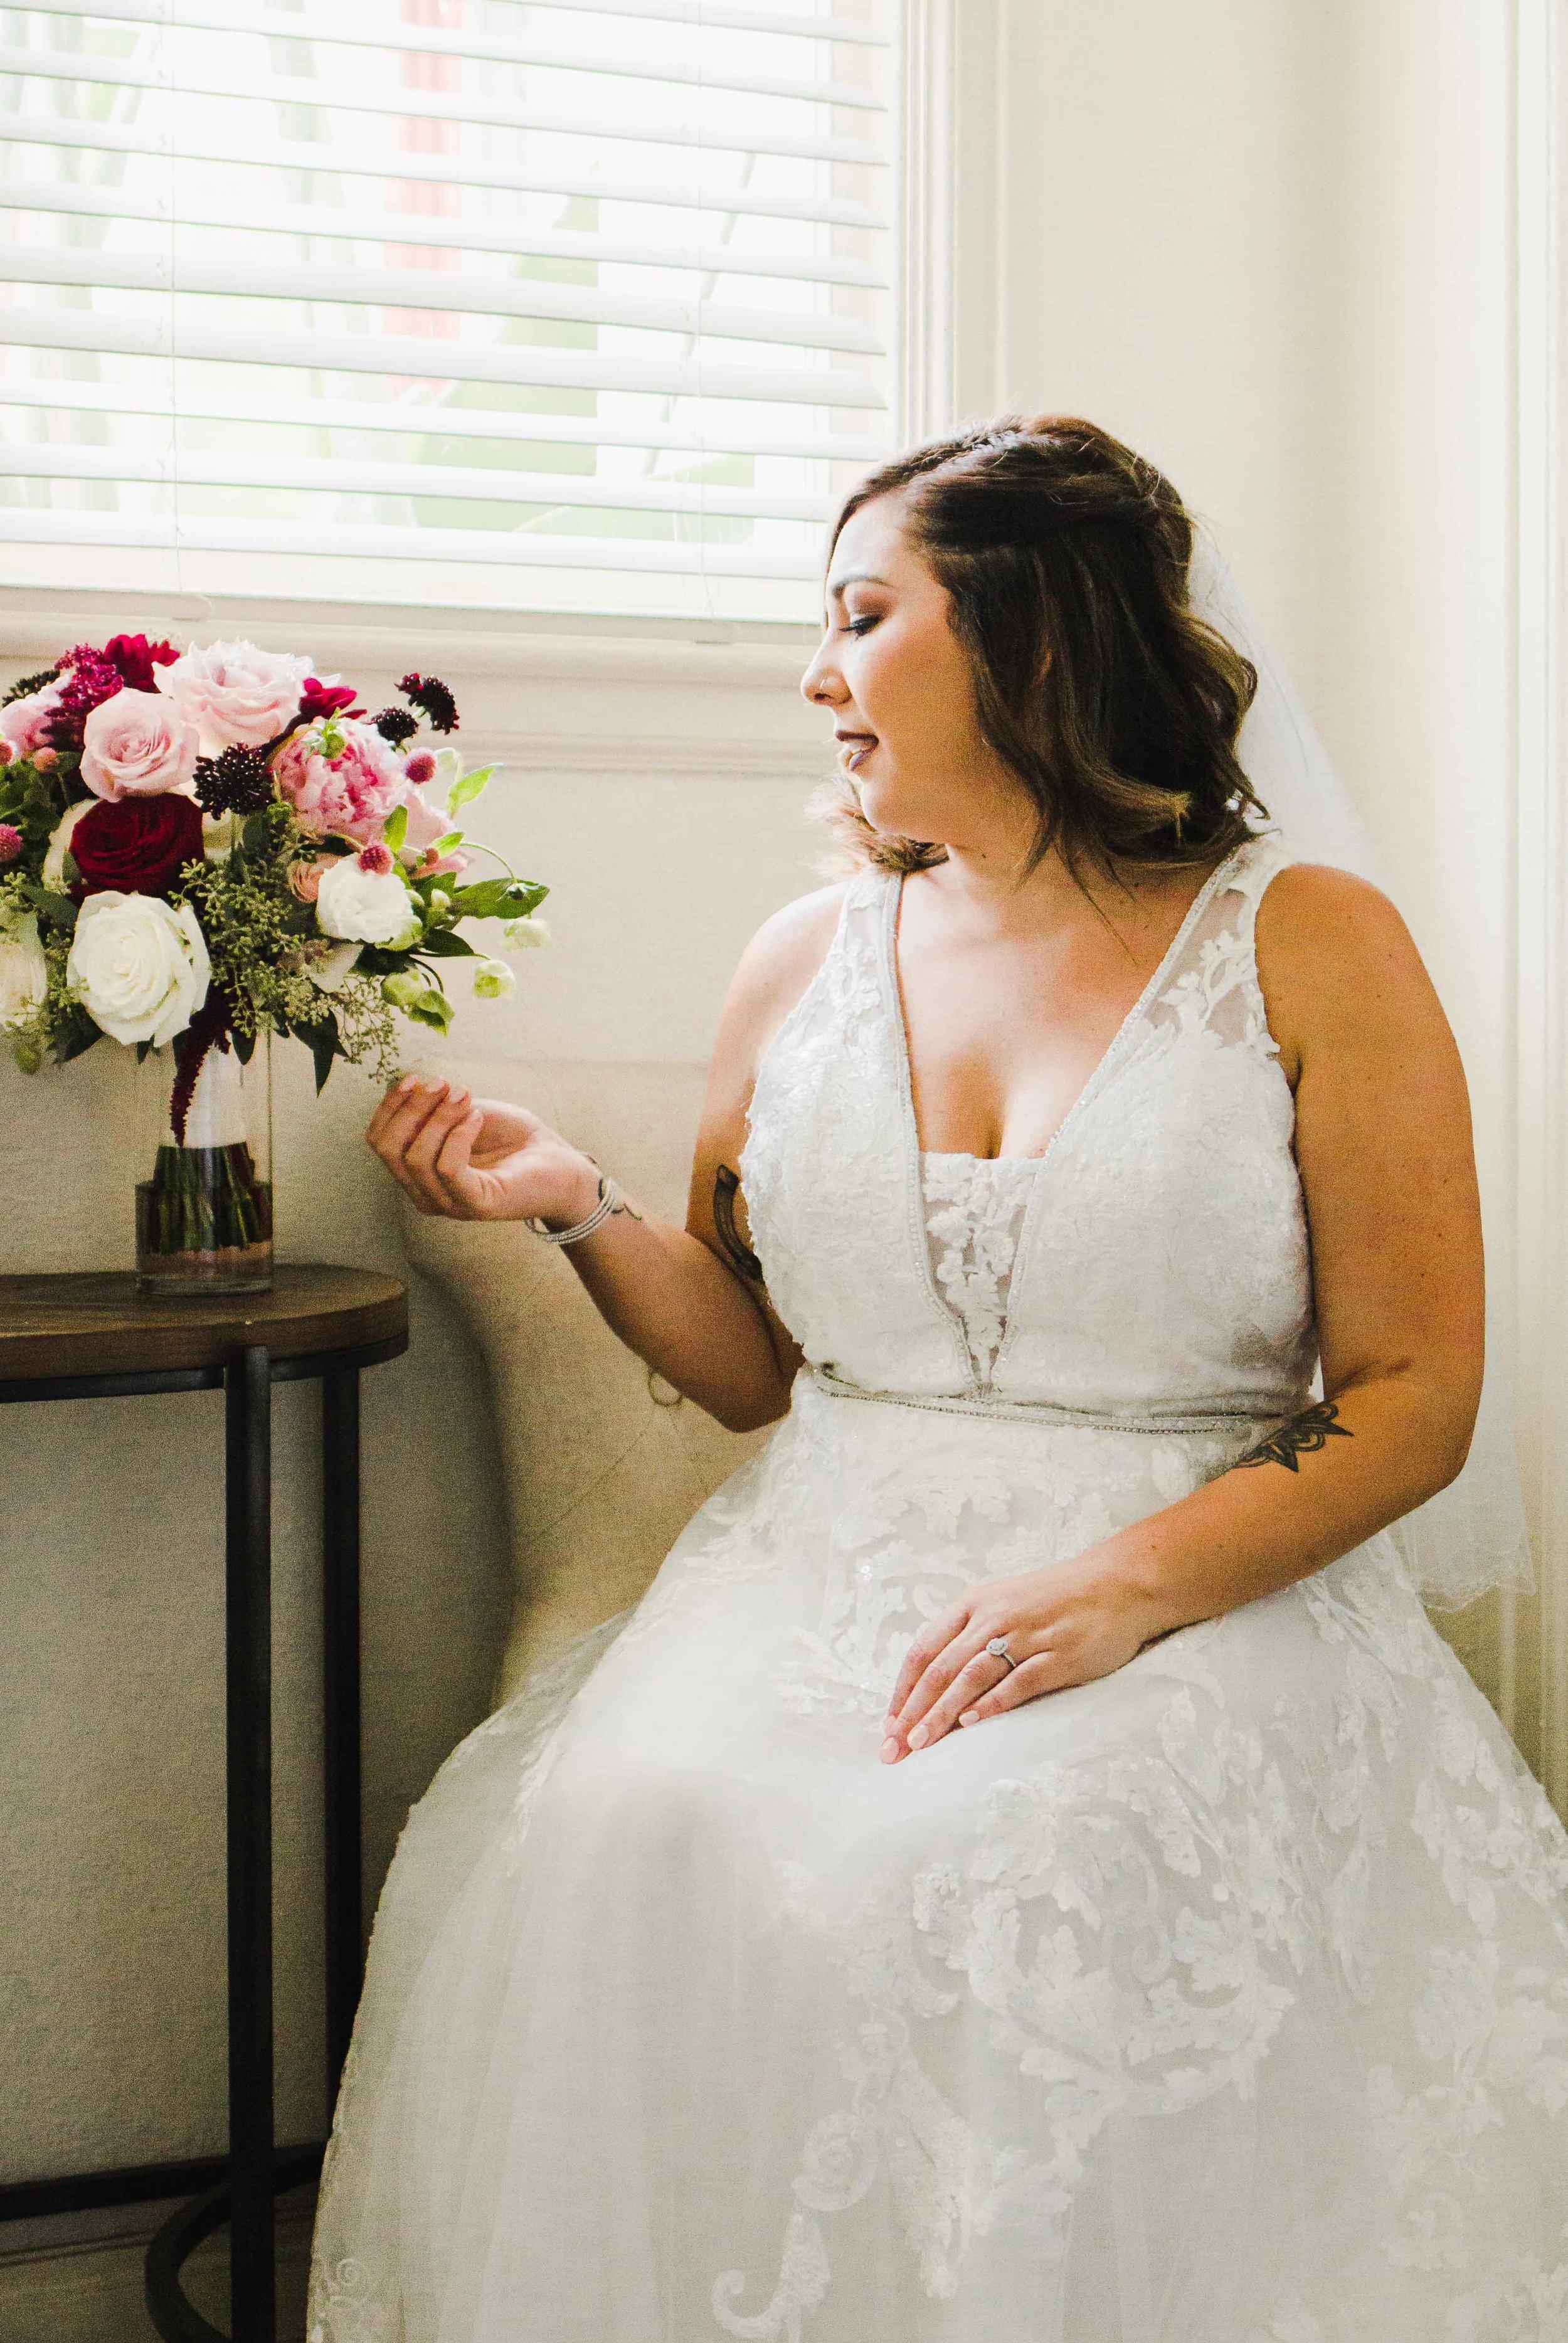 outdoor-fall-wedding-muckenthaler-mansion-orange-county-california-wedding-photographer-2.jpg